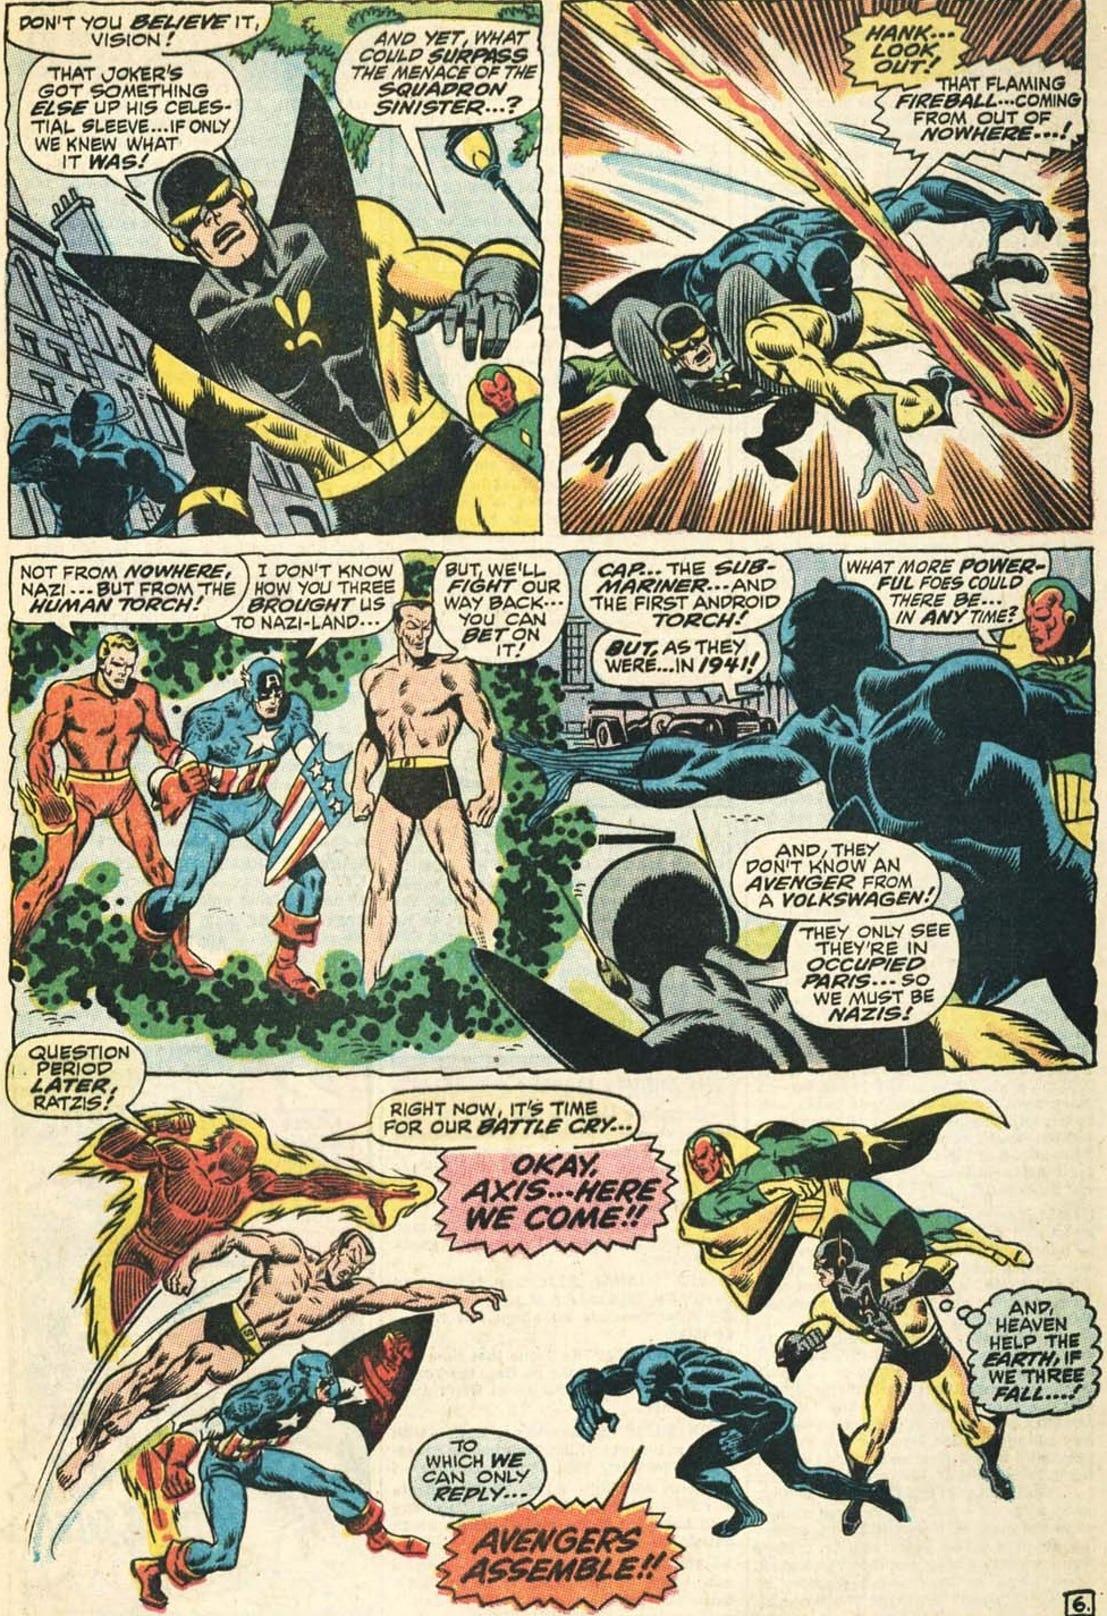 Avengers vol. 1 #71